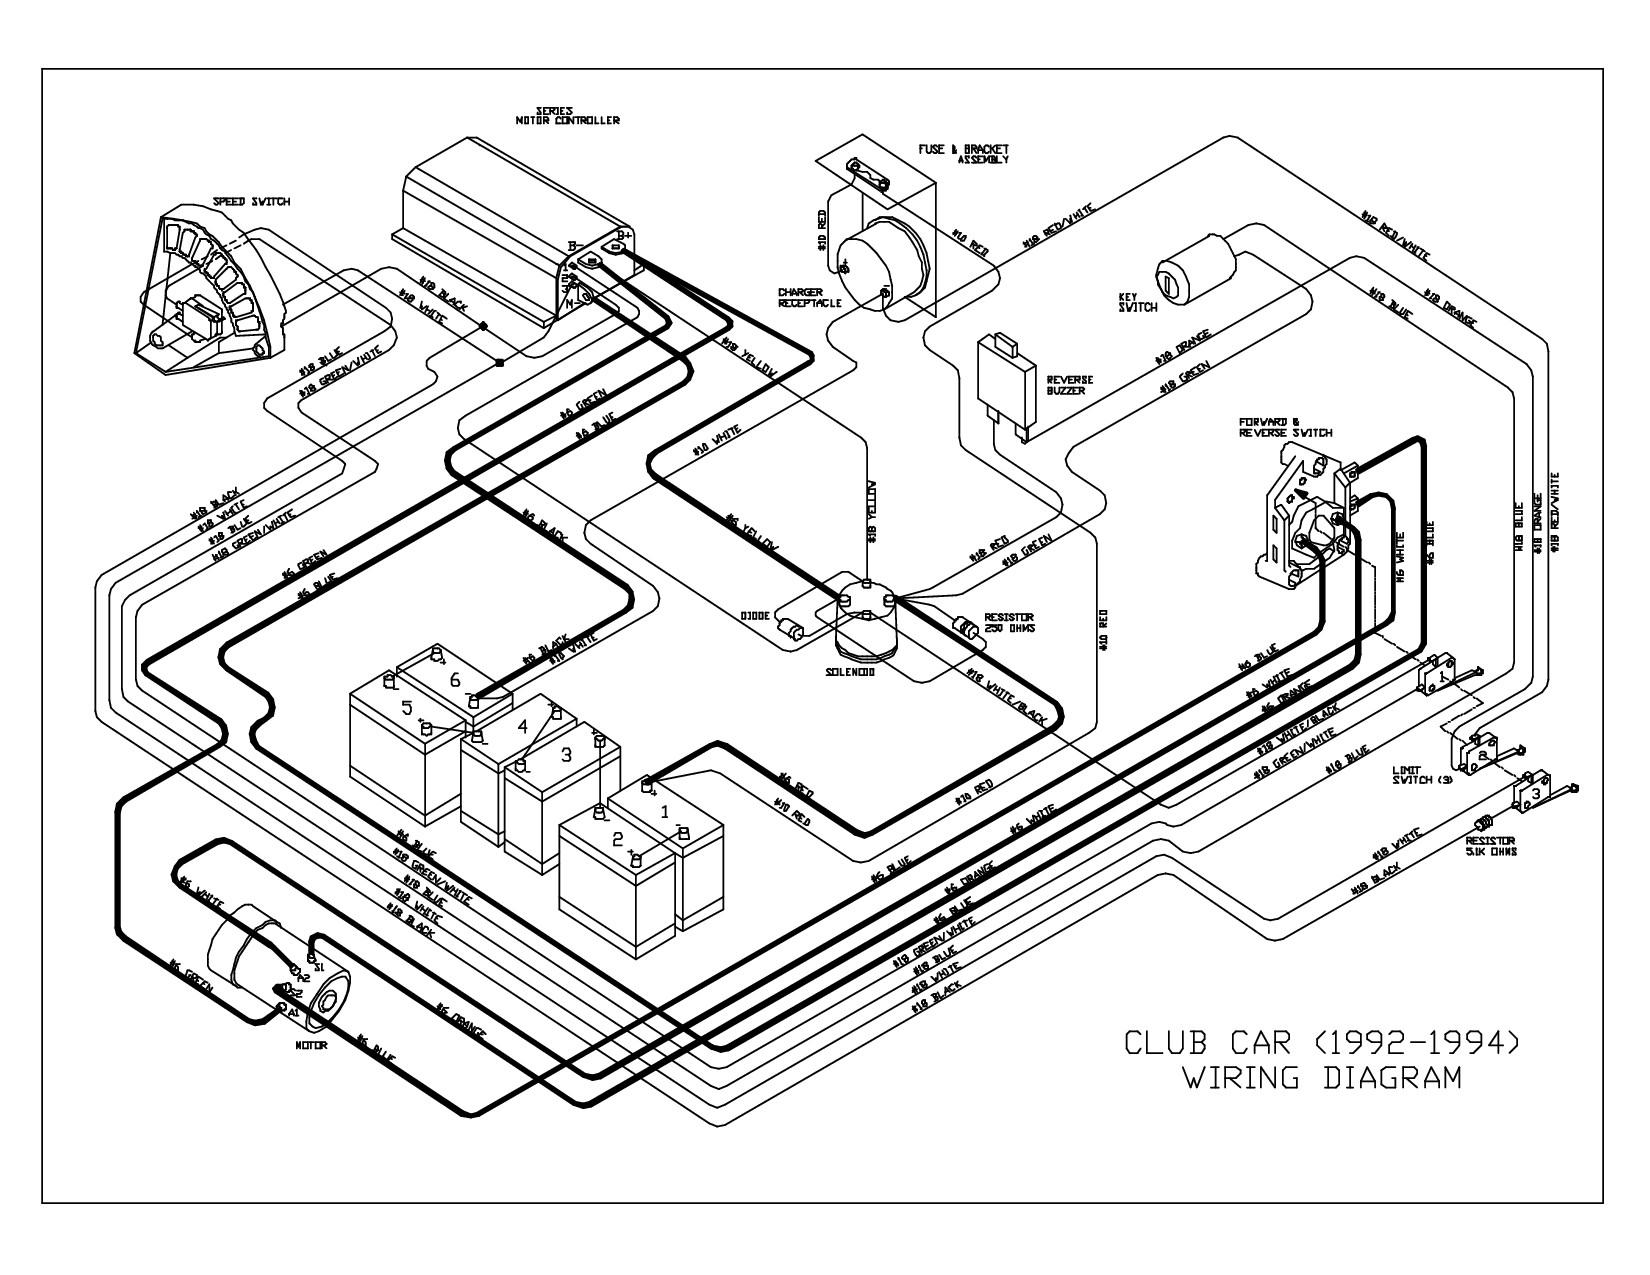 1992 Honda Accord Engine Diagram 1998 2002 Timing Belt Automotive Wiring Speed Of